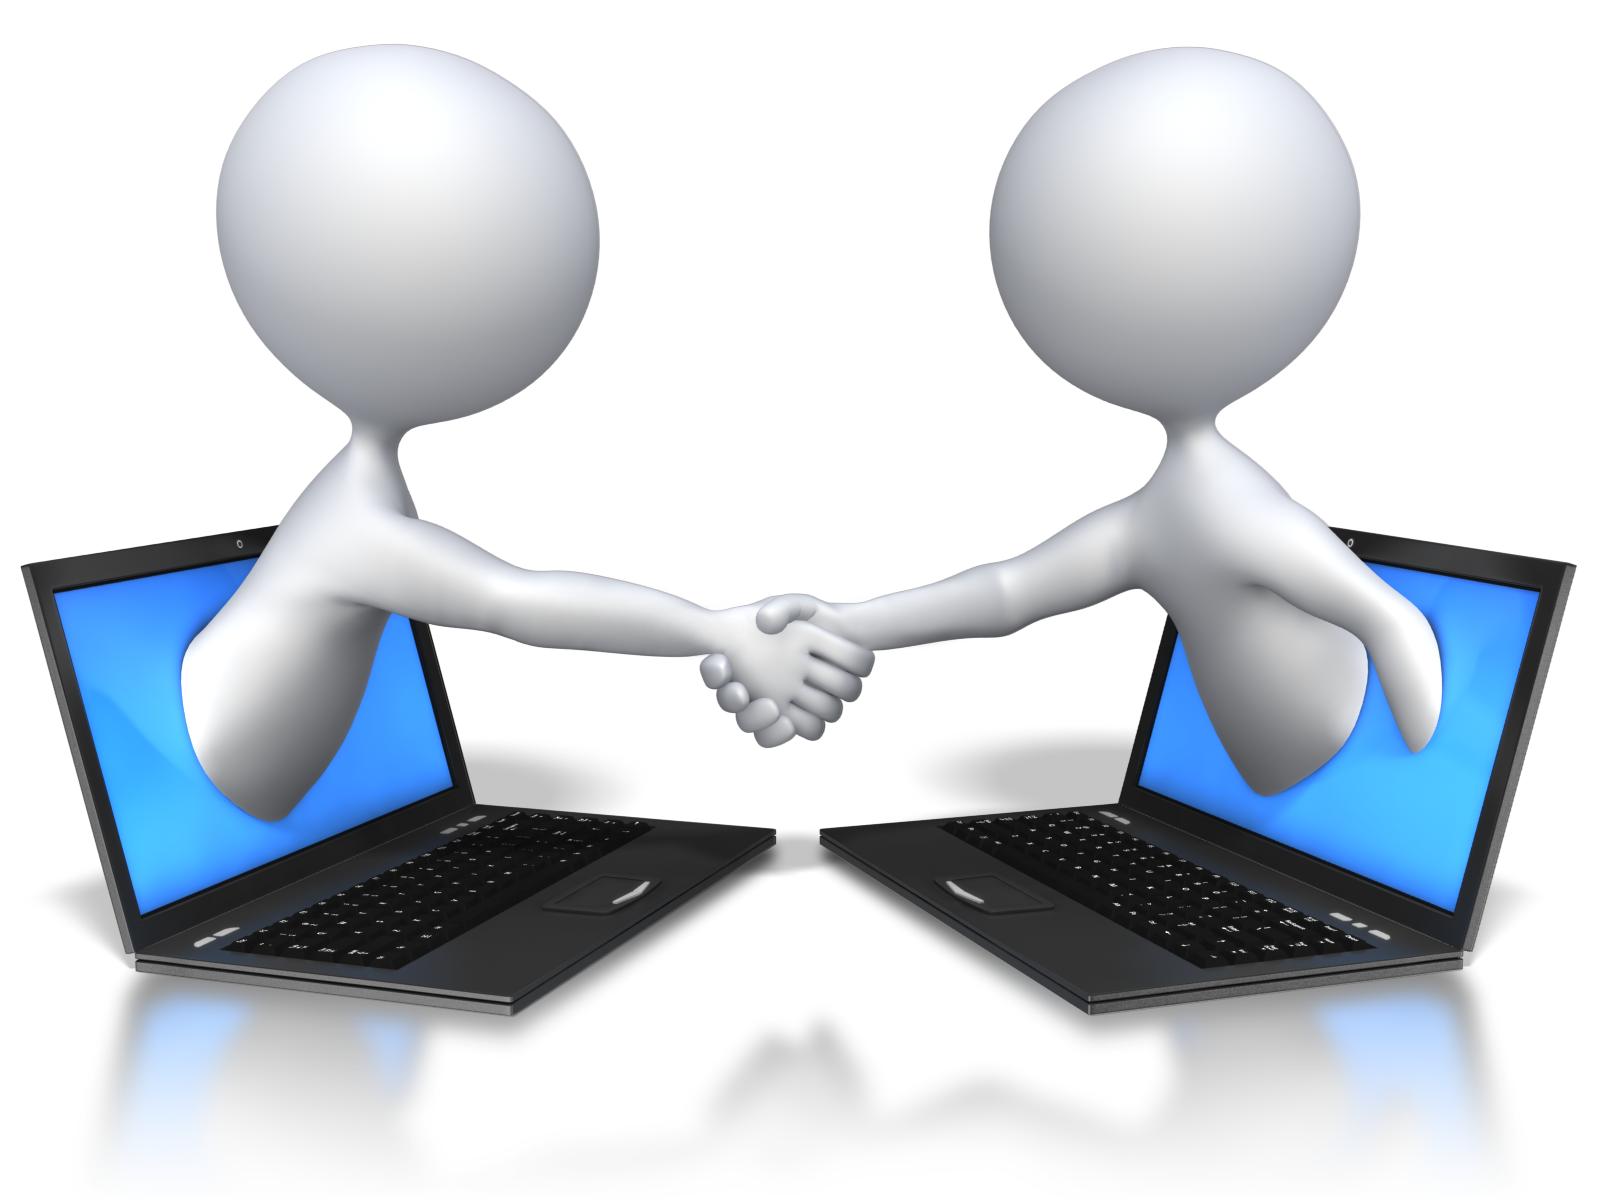 tips to make. Handshake clipart stick figure